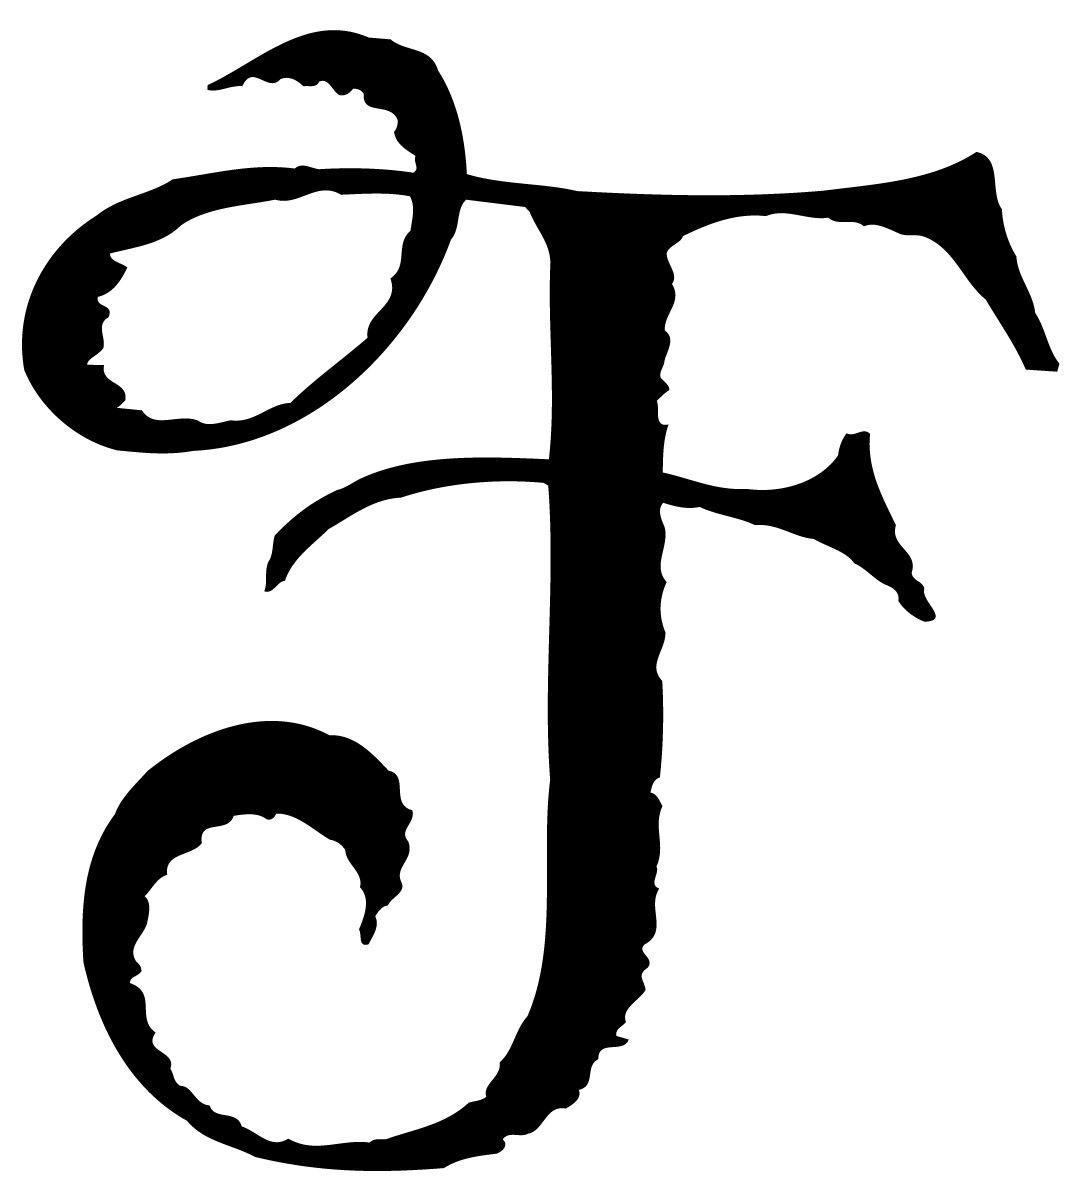 Pin By Deborah Teselle On Clipart Lettering Fonts Letter F